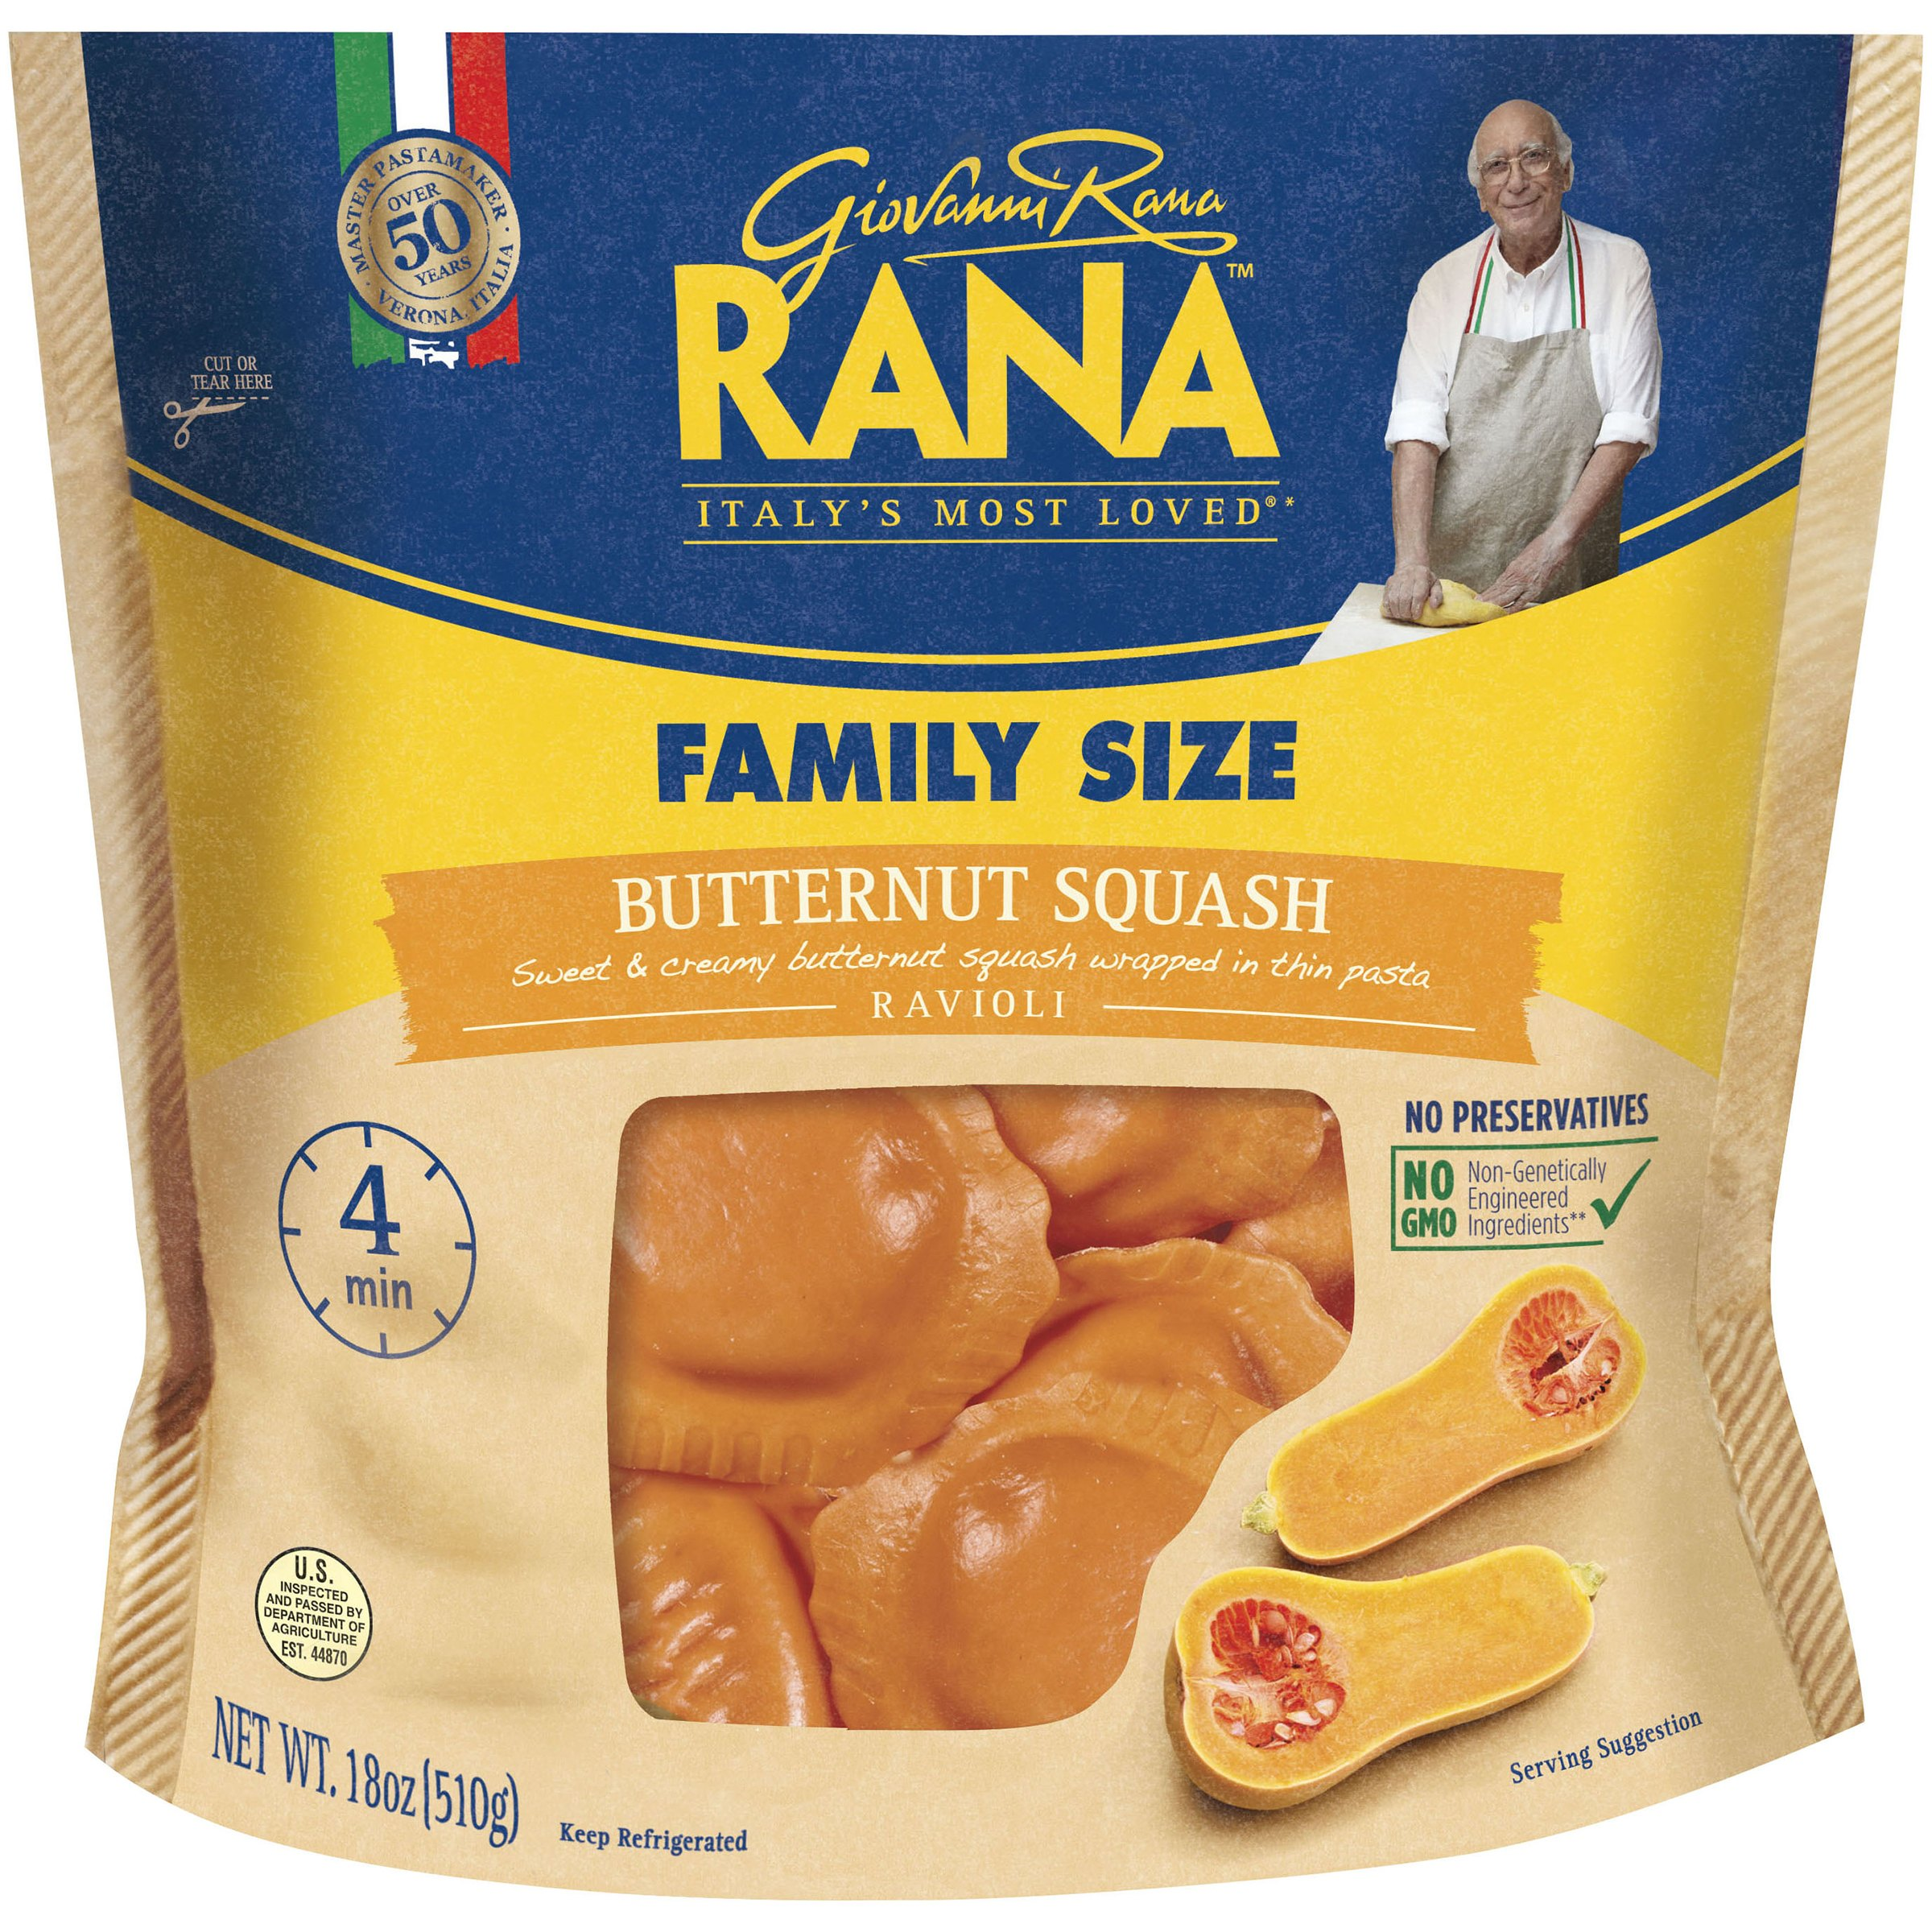 Rana™ Butternut Squash Ravioli 18 oz. Stand-Up Bag